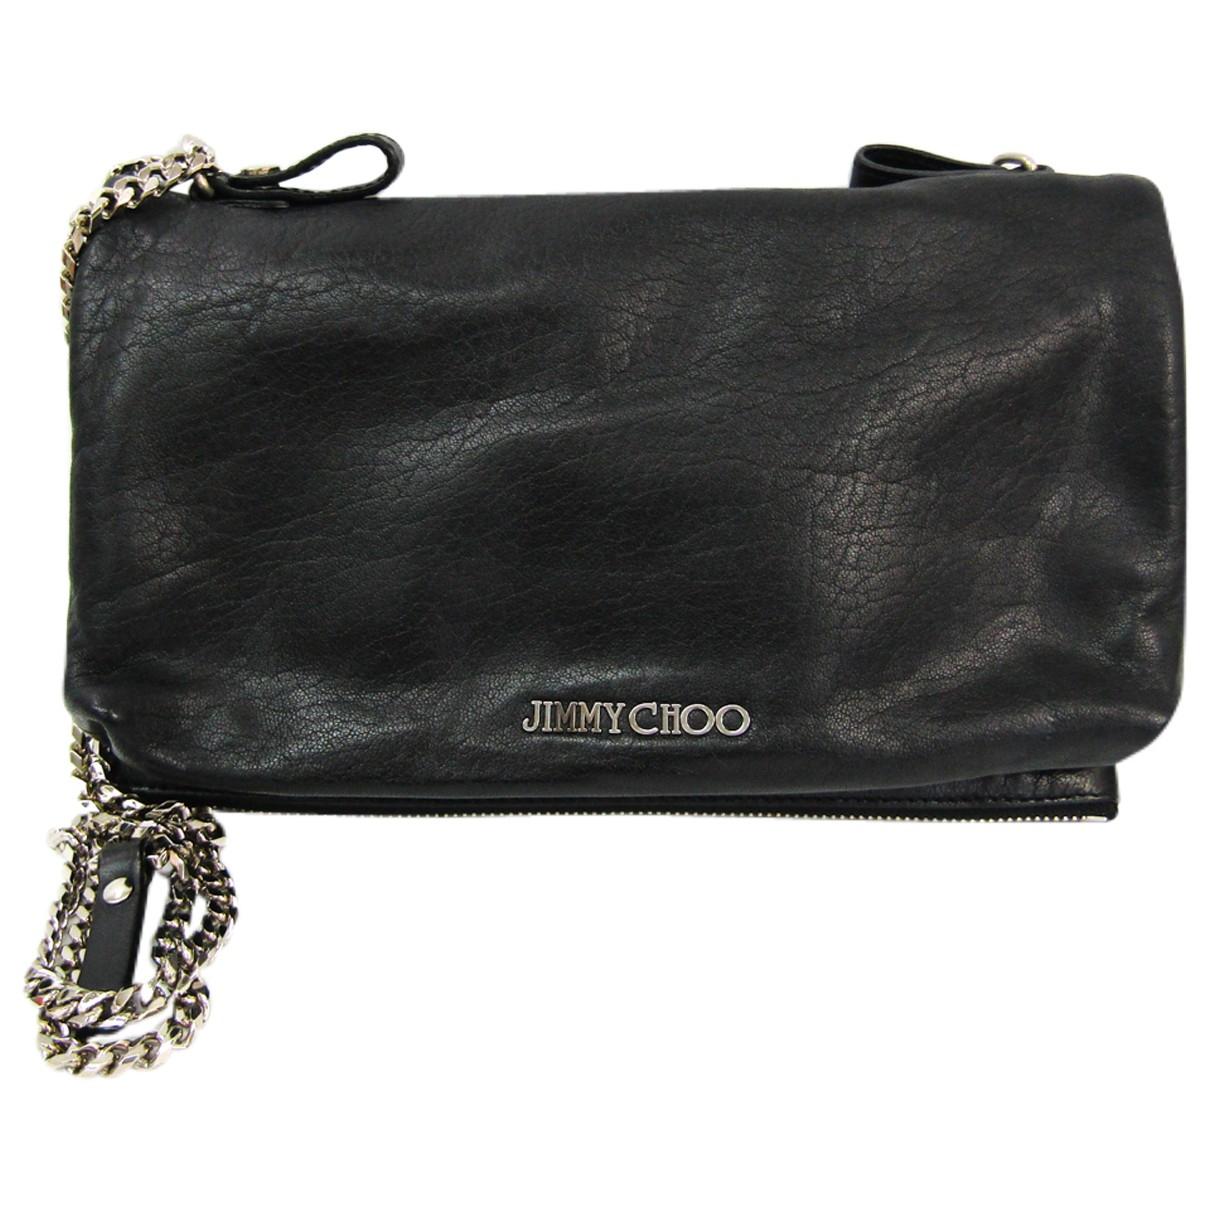 Jimmy Choo N Black Leather handbag for Women N